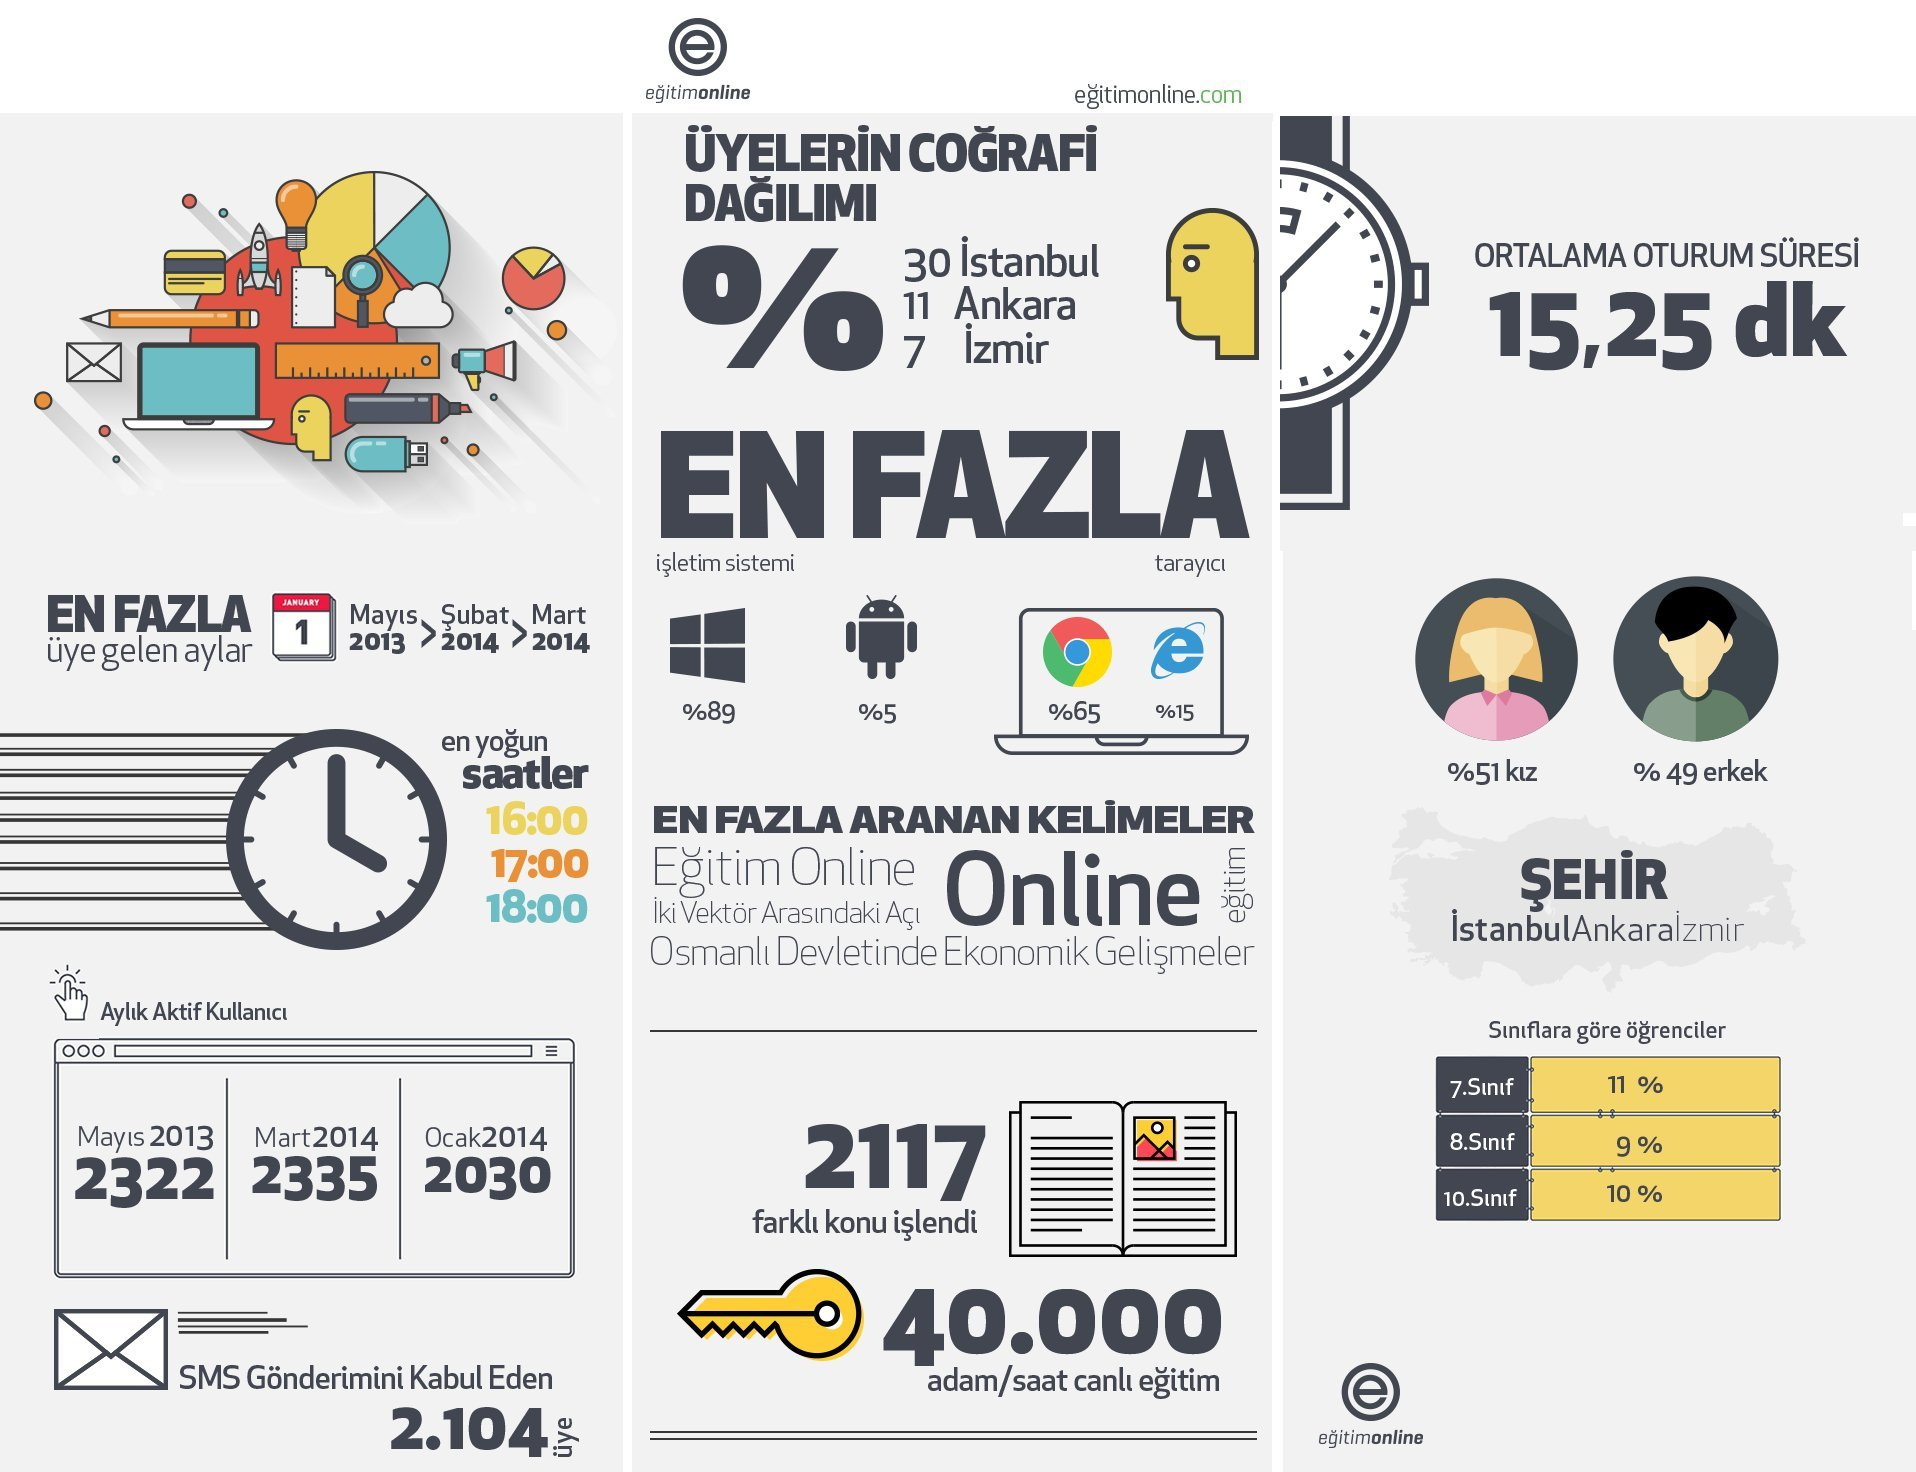 egitimonline.com online egitim faruk erdogan